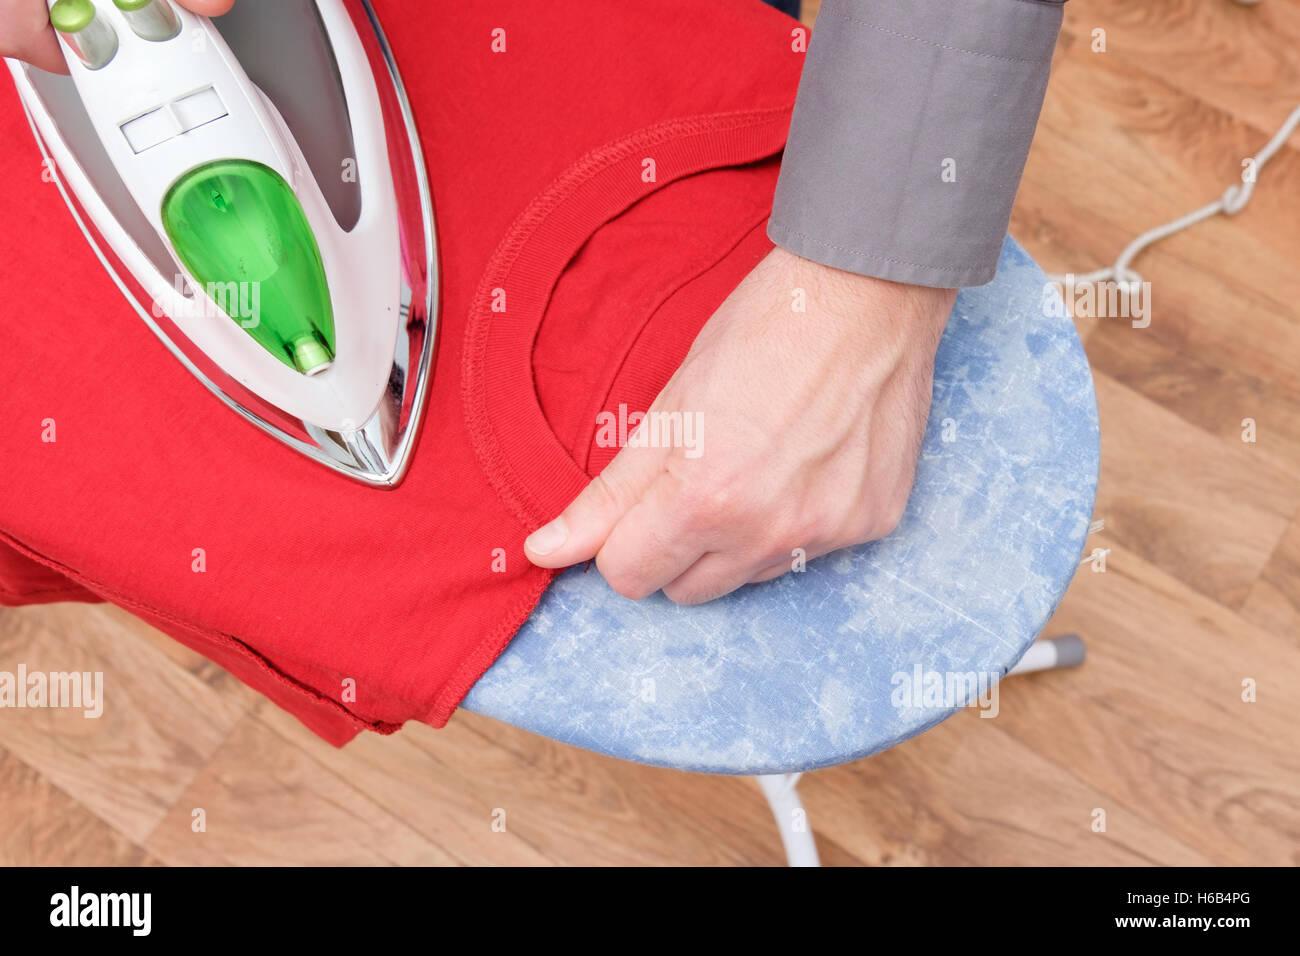 Man ironing hands close up - Stock Image